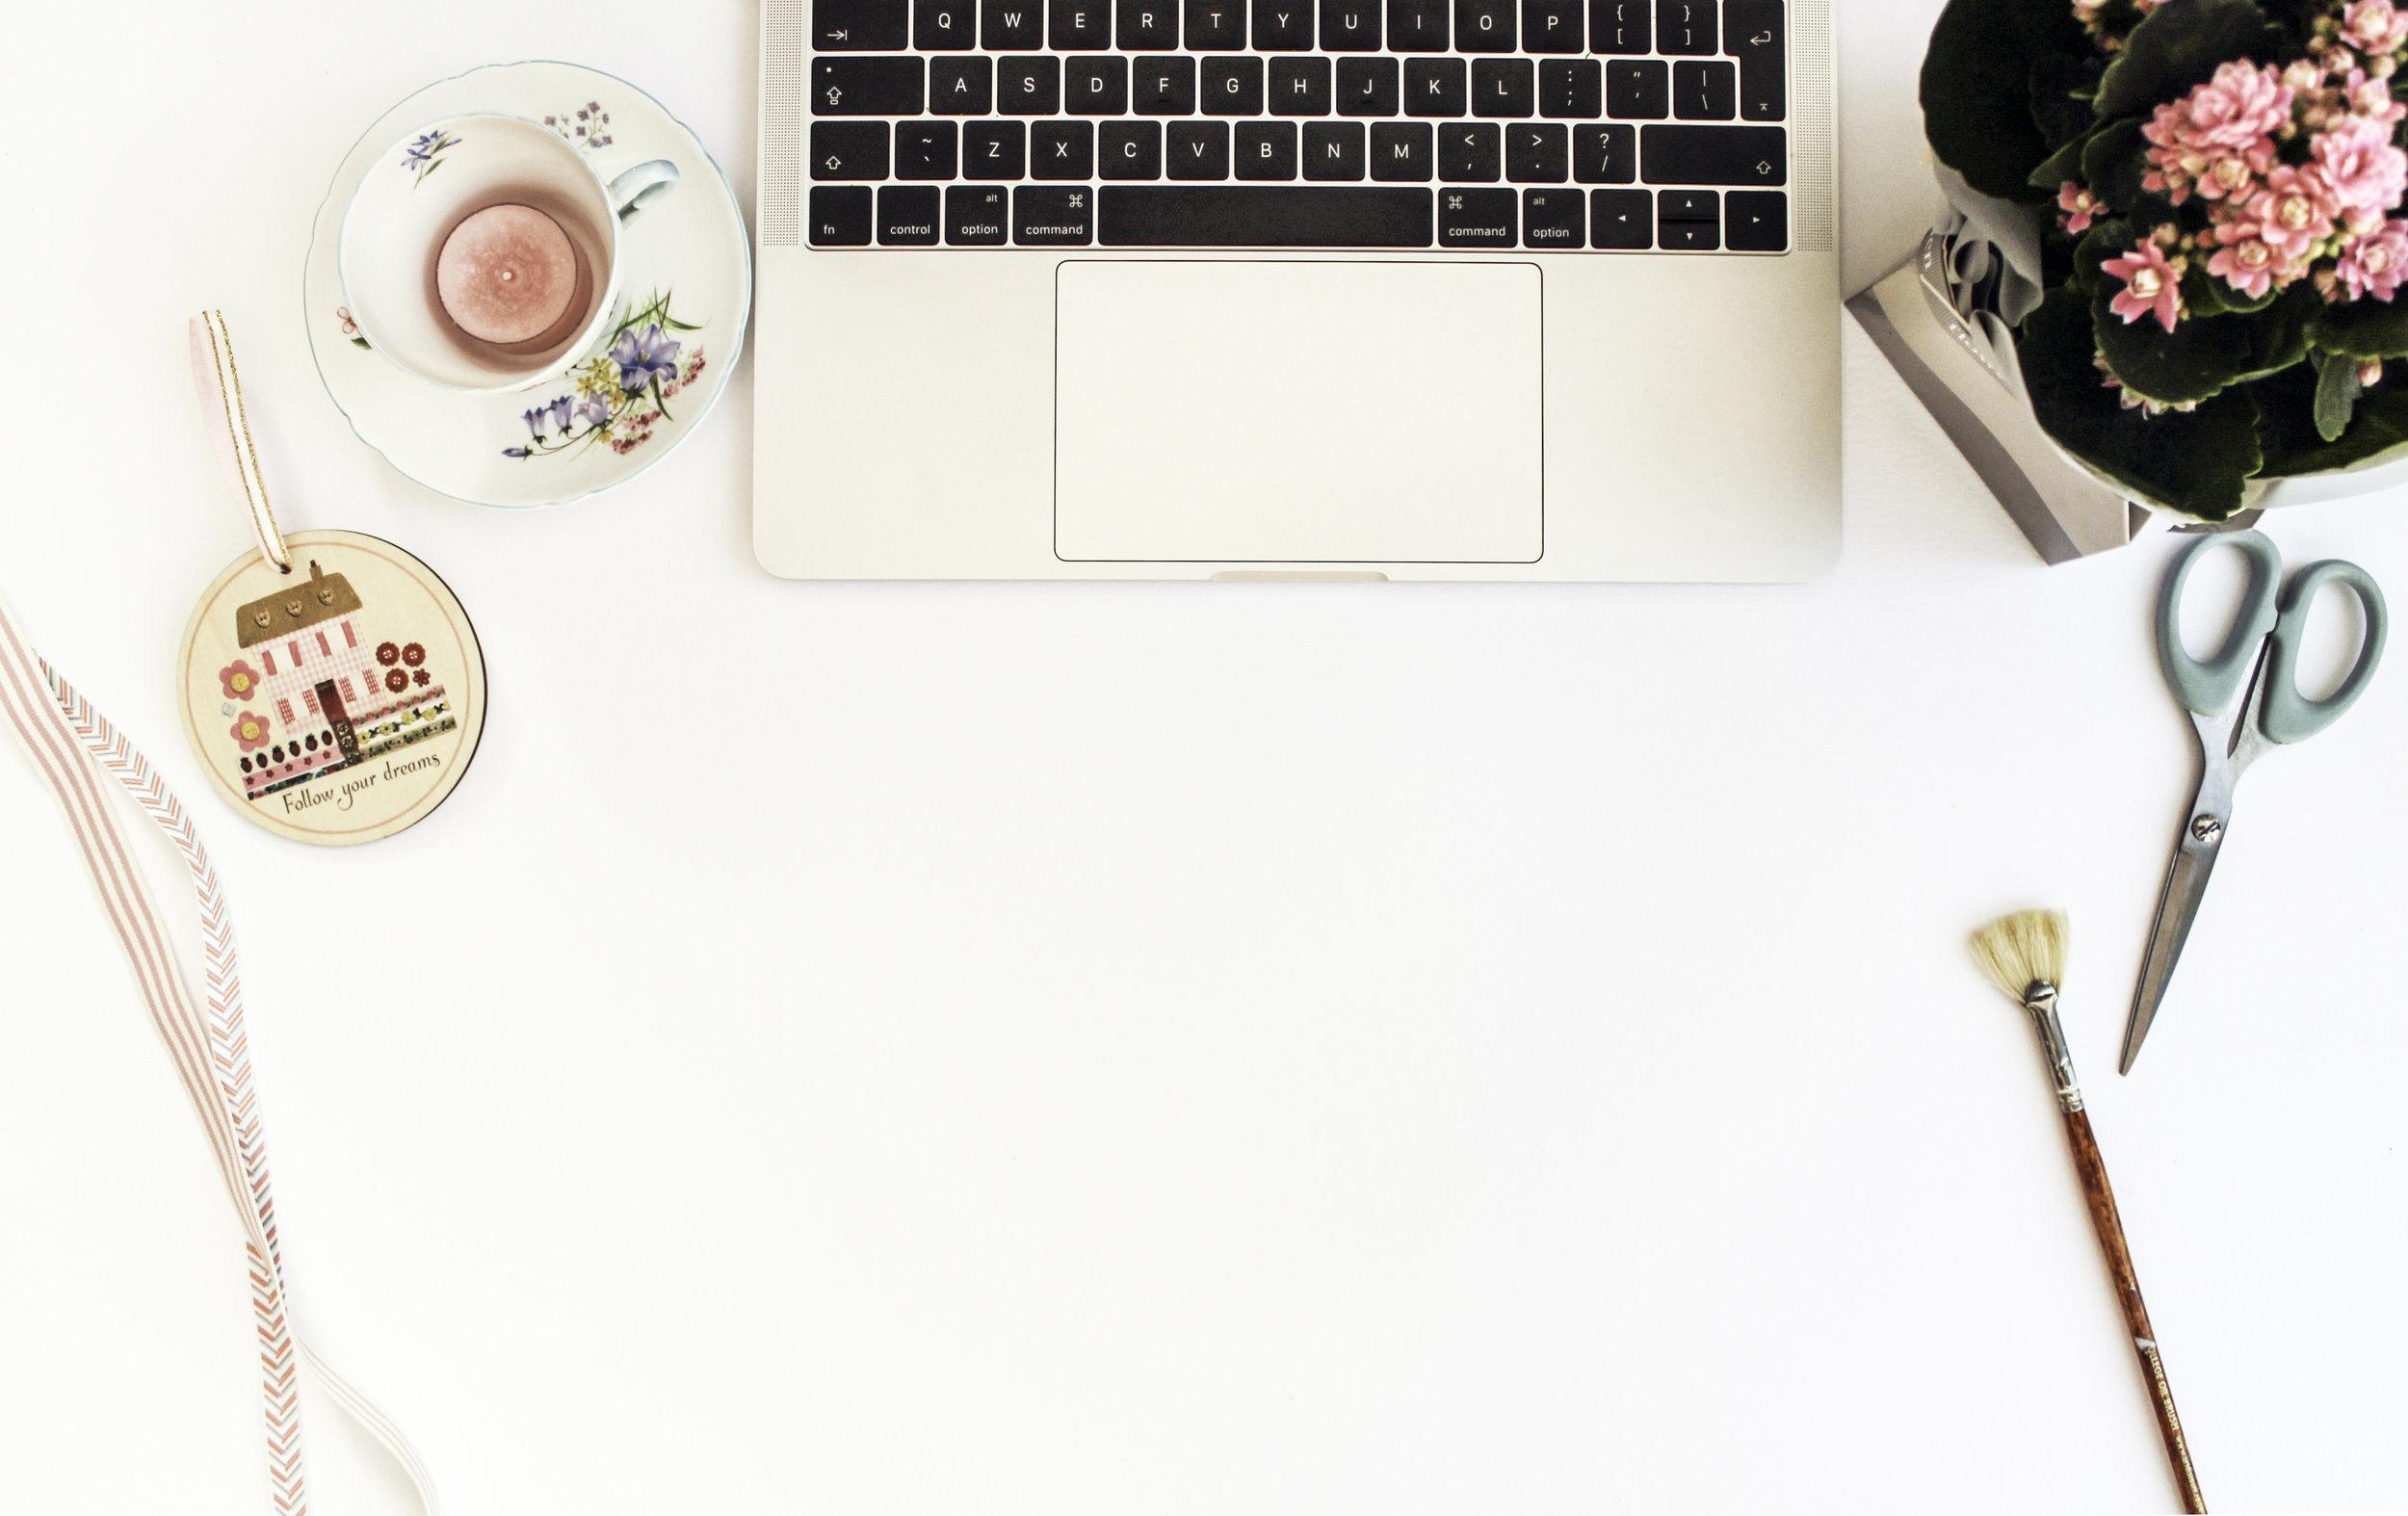 Macbook Pro womans desk v2 copy.jpeg